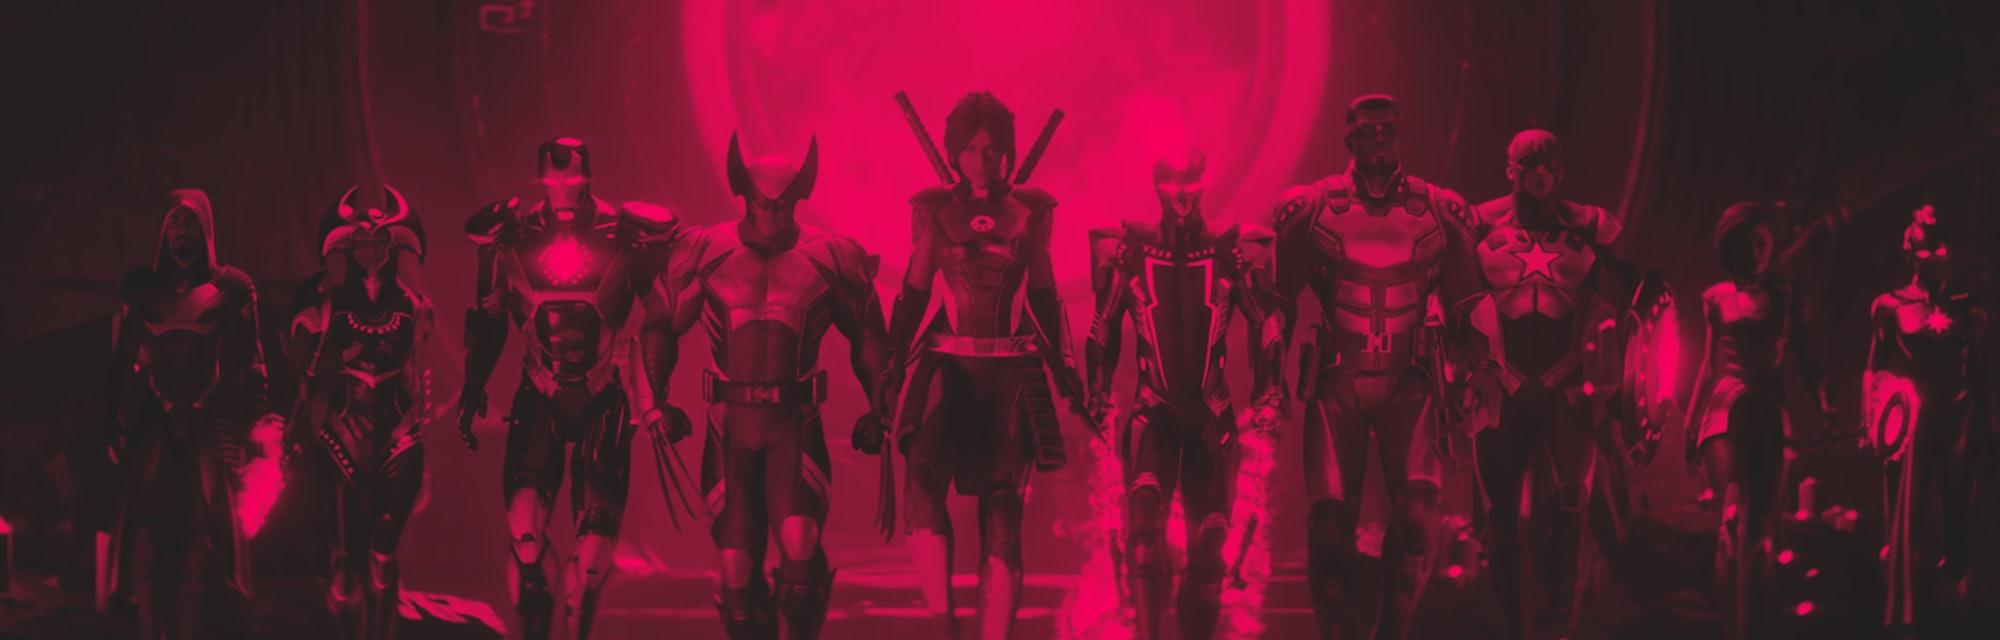 Midnight Suns roster